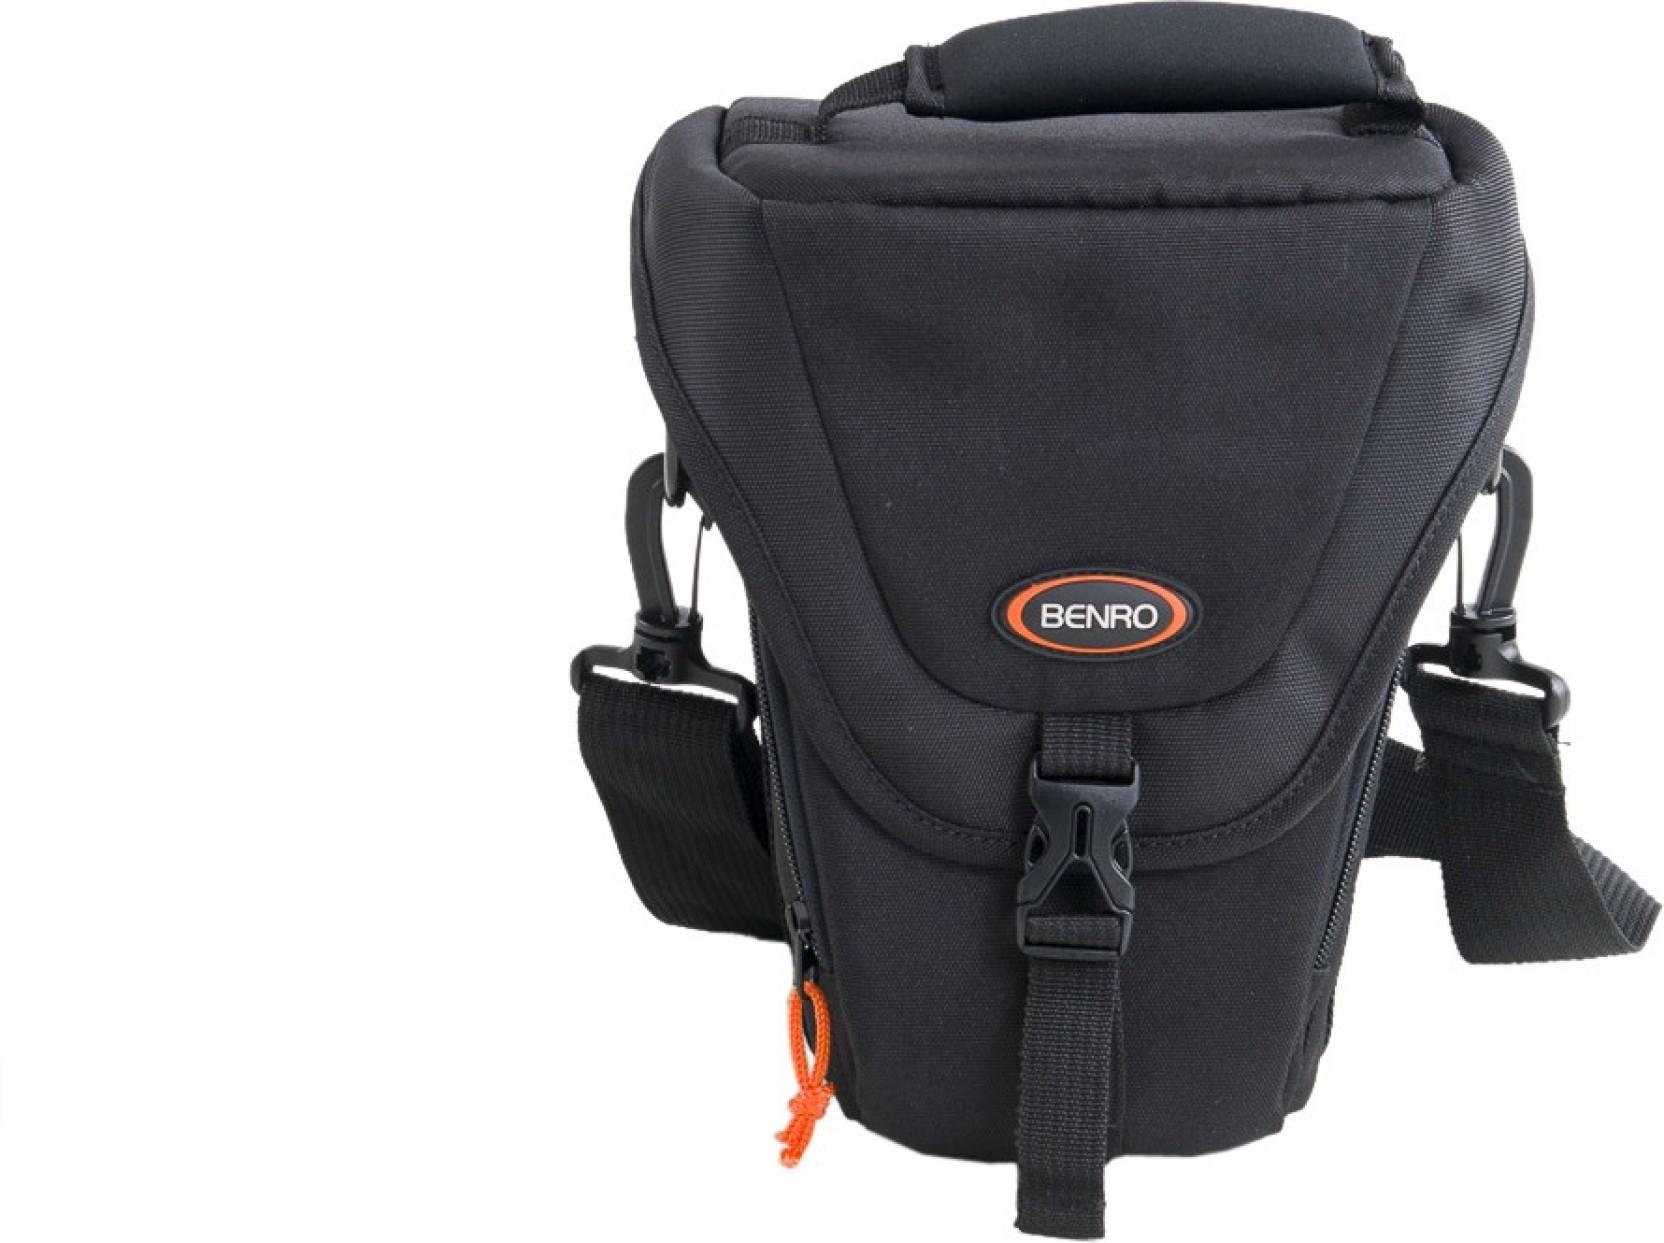 Benro Gamma Z20 Black Camera Bag Lowepro Adventura Sh 120 Ii Share